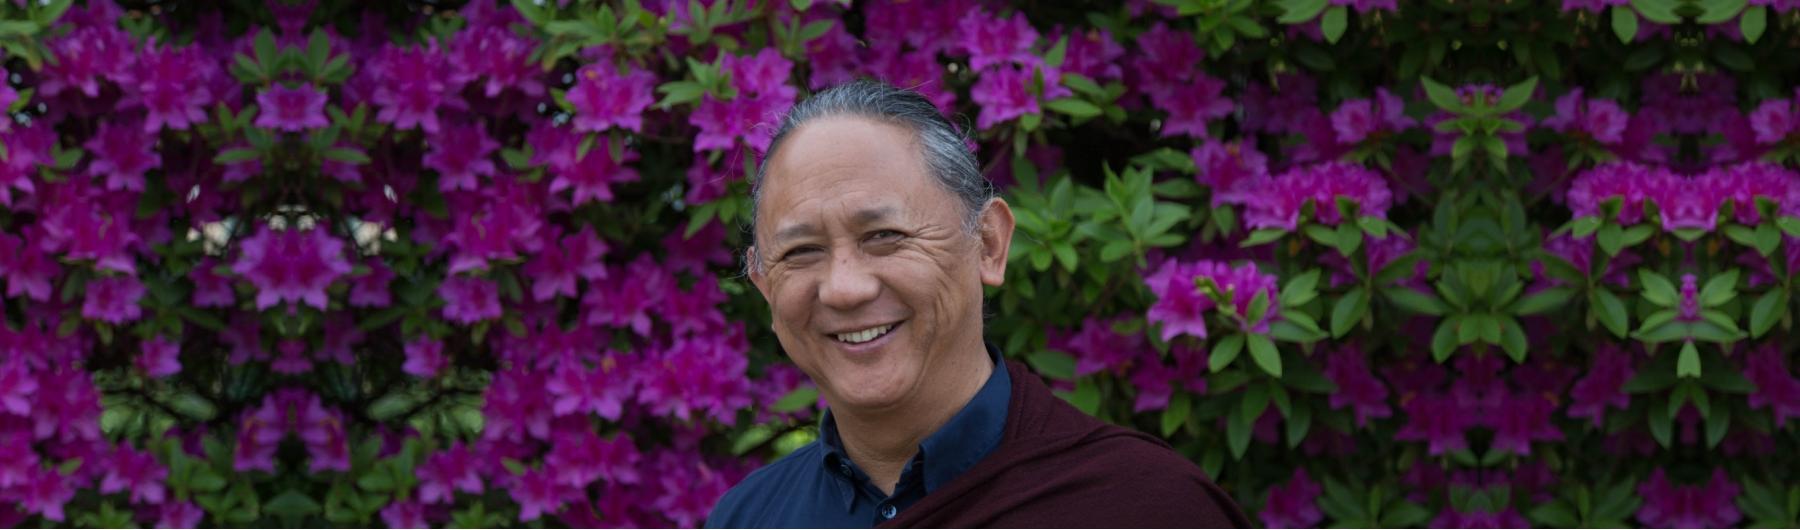 Modern Day Bodhisattva Seminar with Venerable Dzigar Kongtrul Rinpoche